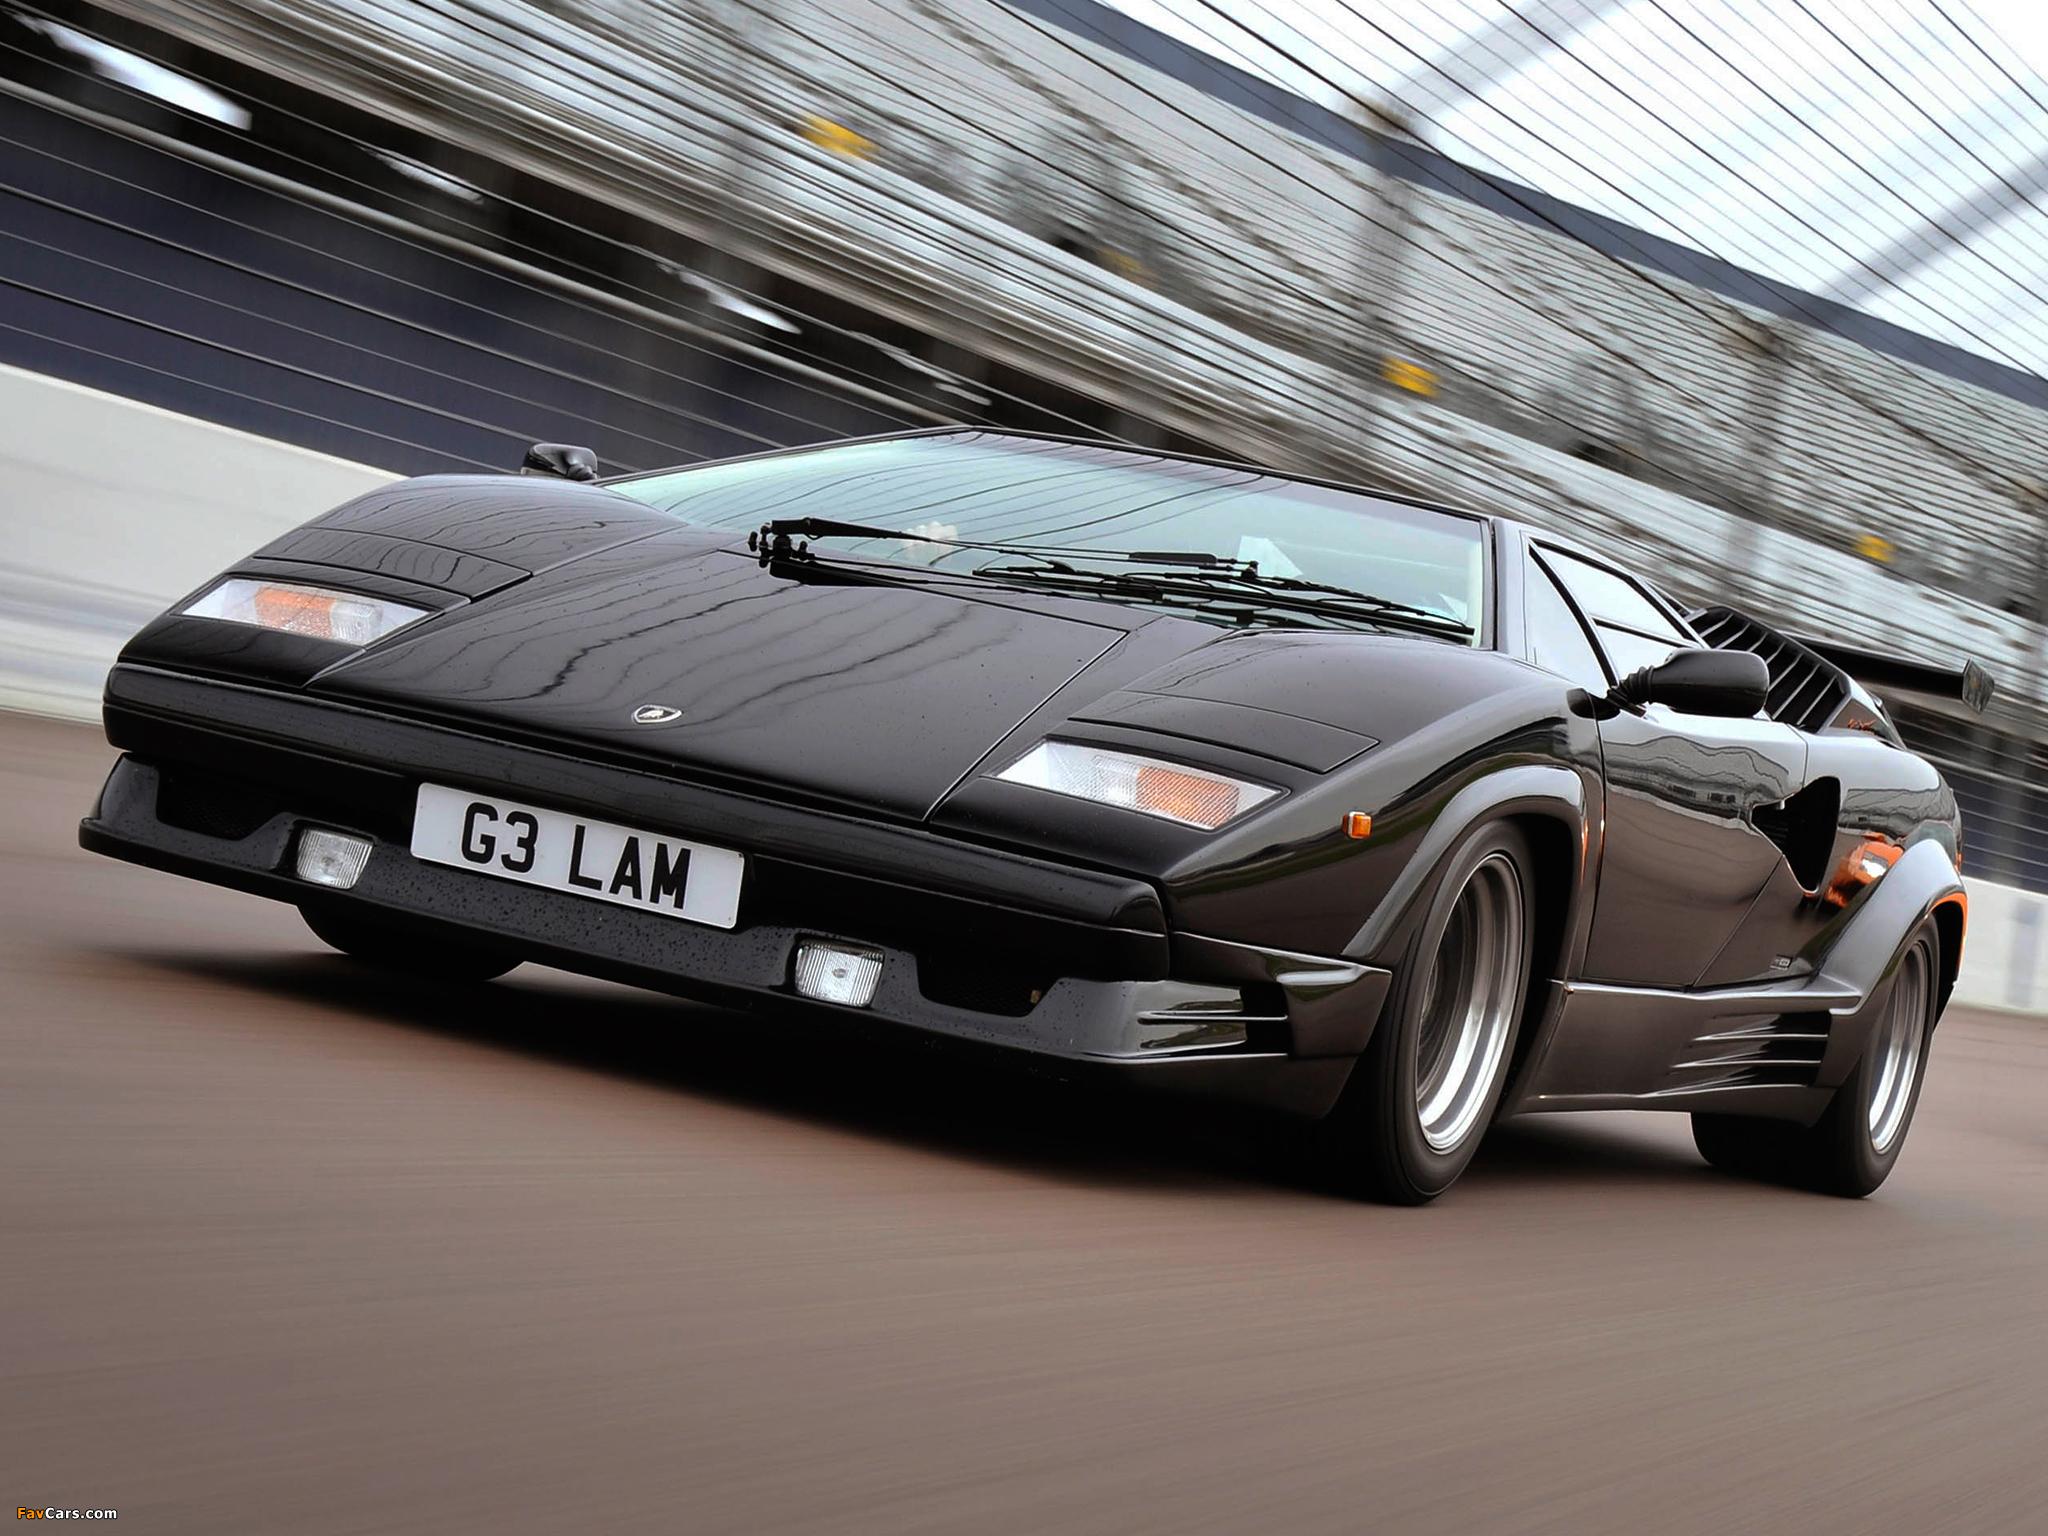 wallpapers_lamborghini_countach_1988_4 Elegant Lamborghini Countach 25th Anniversary Specs Cars Trend